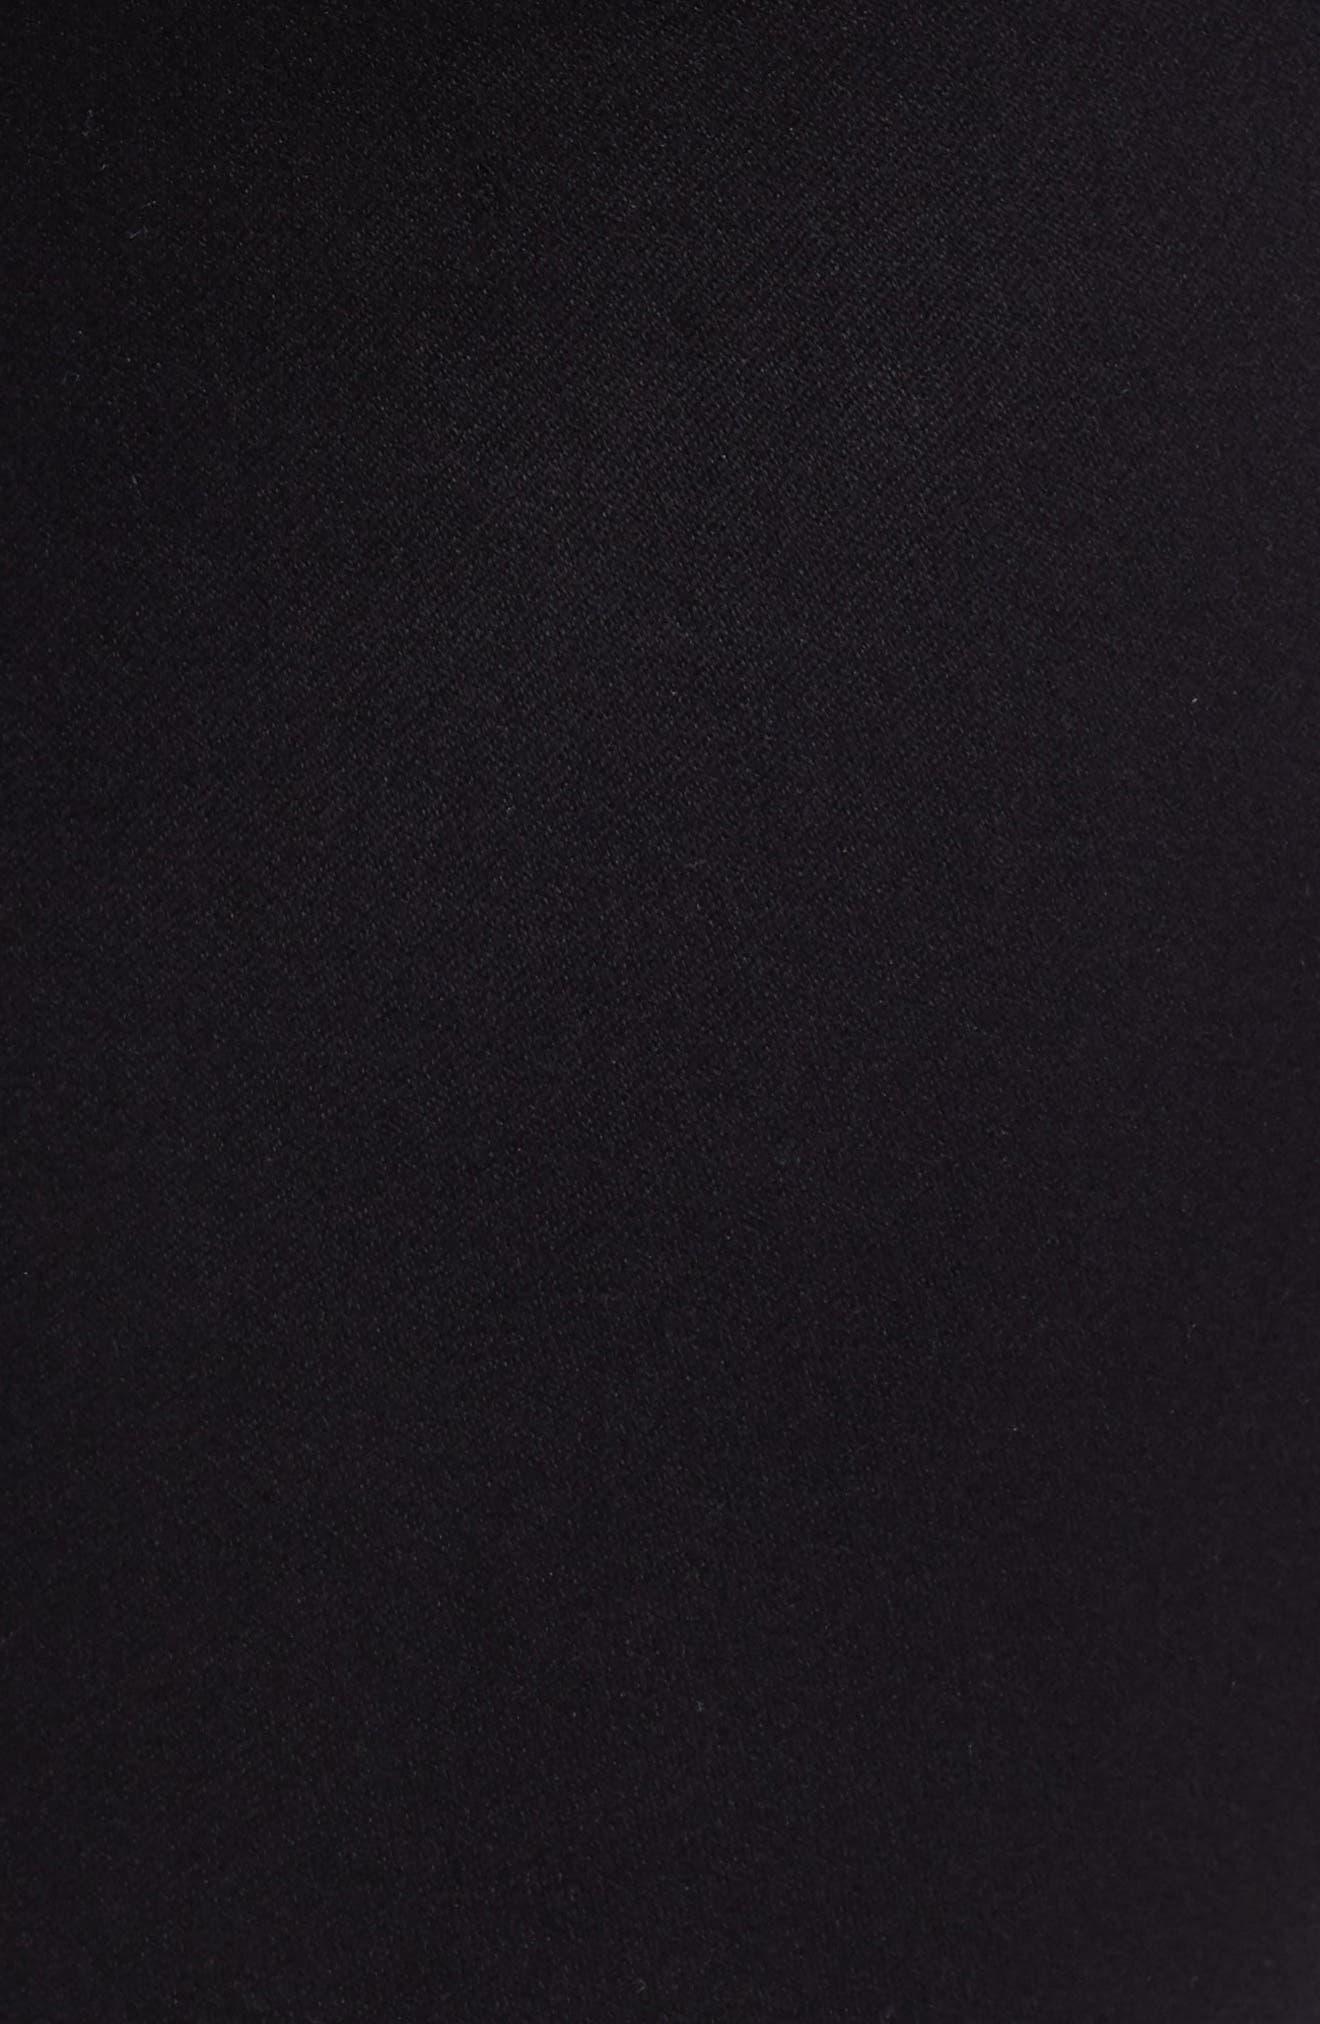 Butter Ankle Super Skinny Maternity Jeans,                             Alternate thumbnail 5, color,                             BLACK